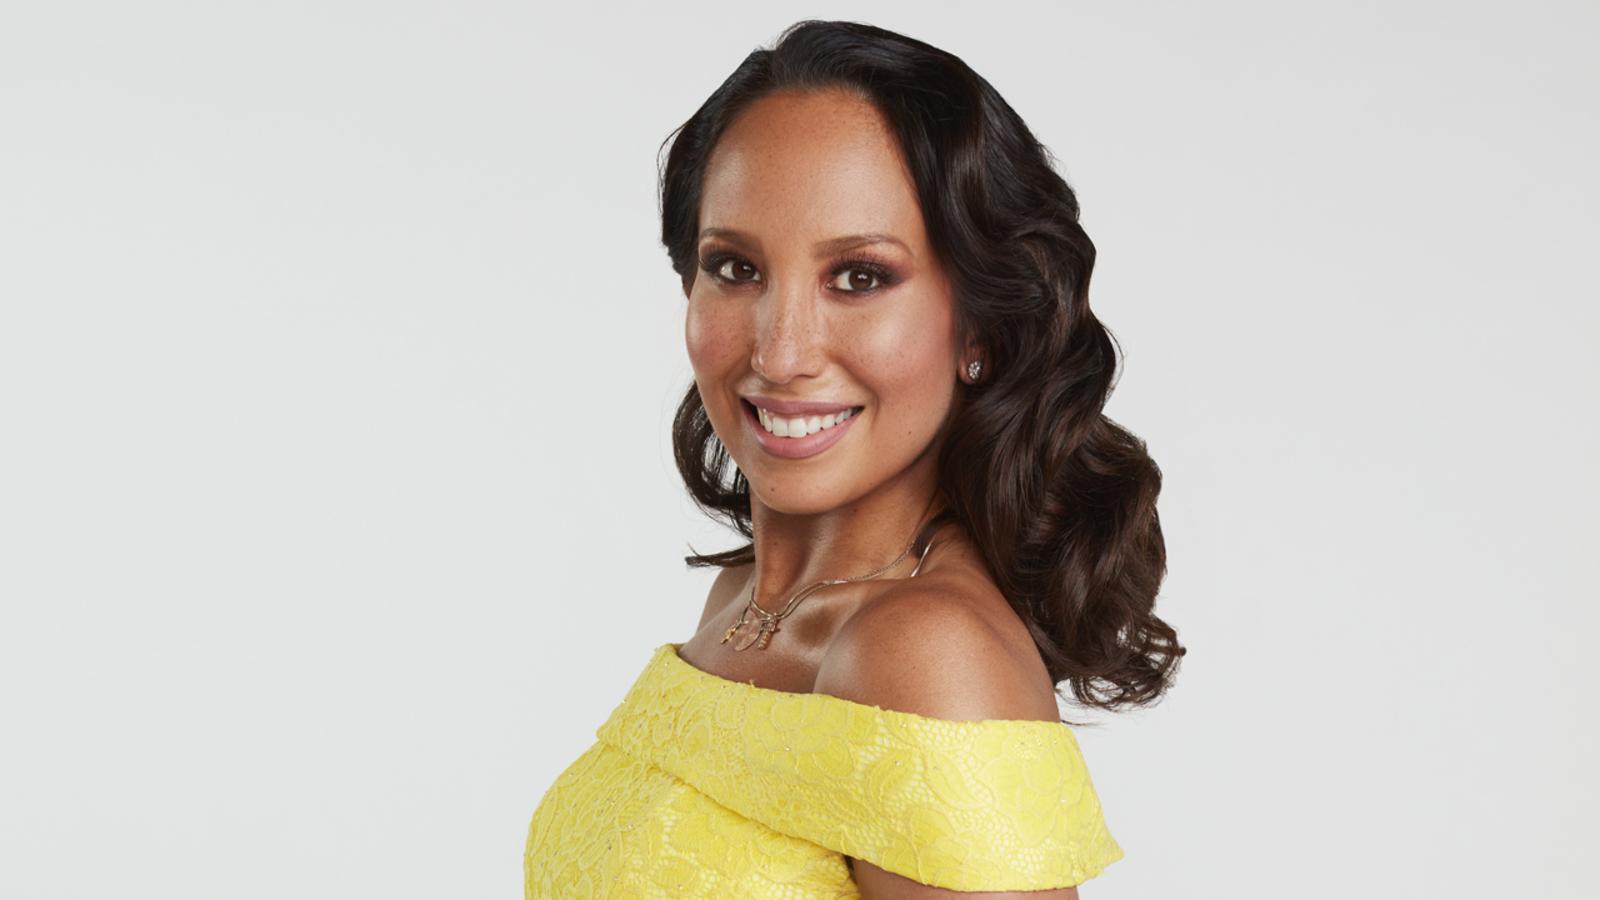 'Dancing With the Stars' pro Cheryl Burke says she has COVID-19 - ABC7 San Francisco - KGO-TV